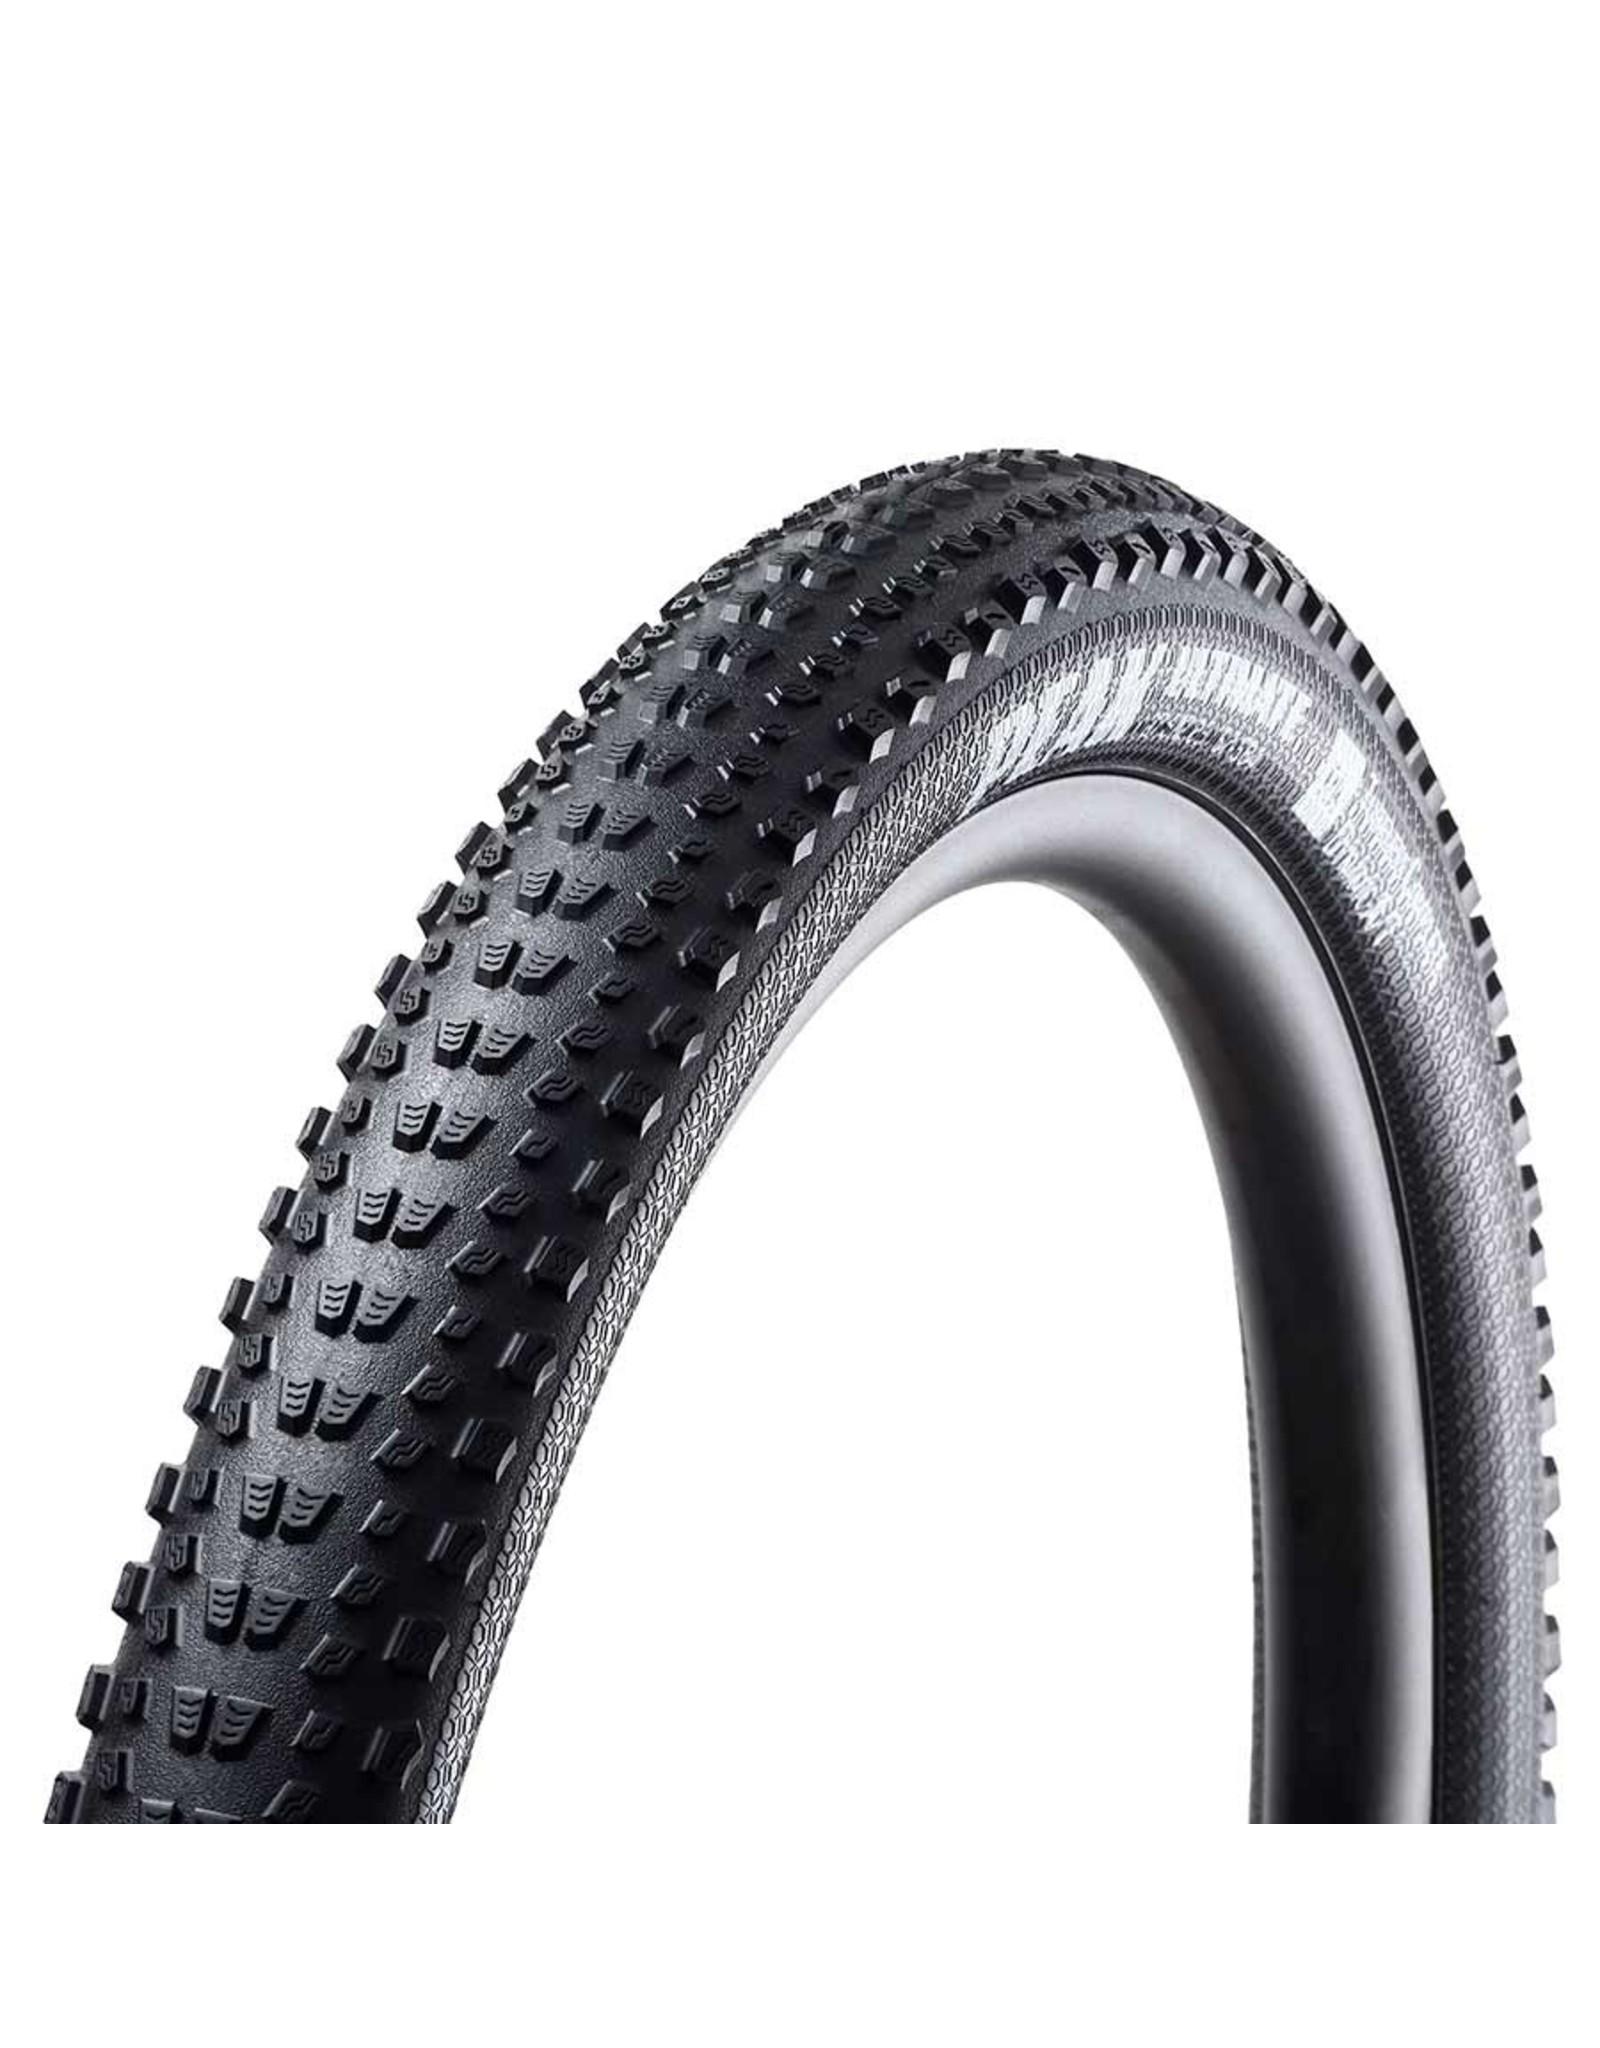 Goodyear Goodyear, Peak, Tire, 27.5''x2.25, Folding, Tubeless Ready, Dynamic:A/T, Ultimate, 120TPI, Black